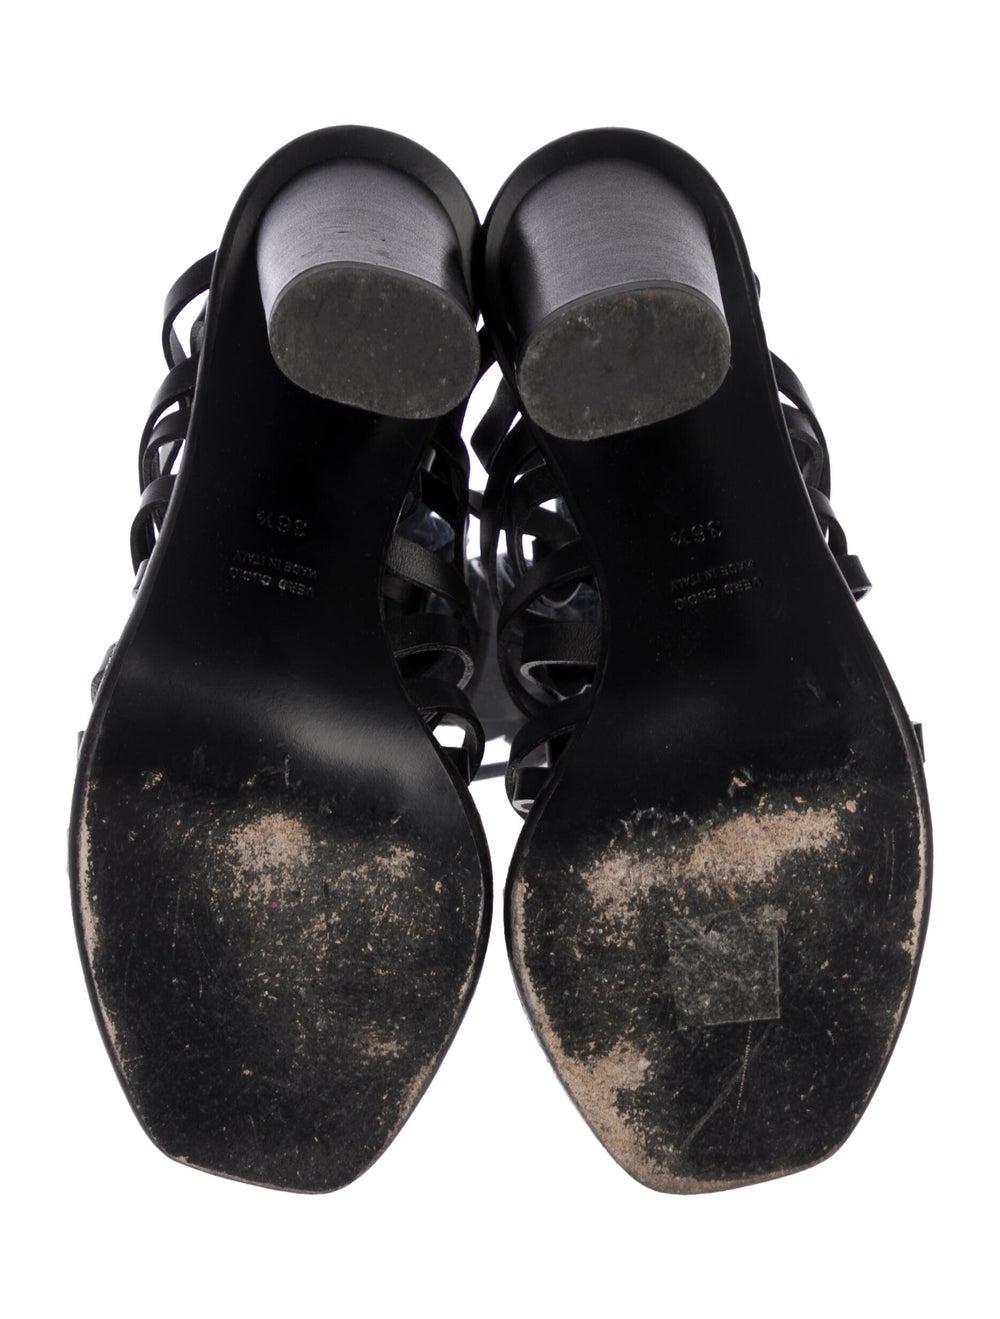 Altuzarra Caged Lace-Up Sandals Black - image 5